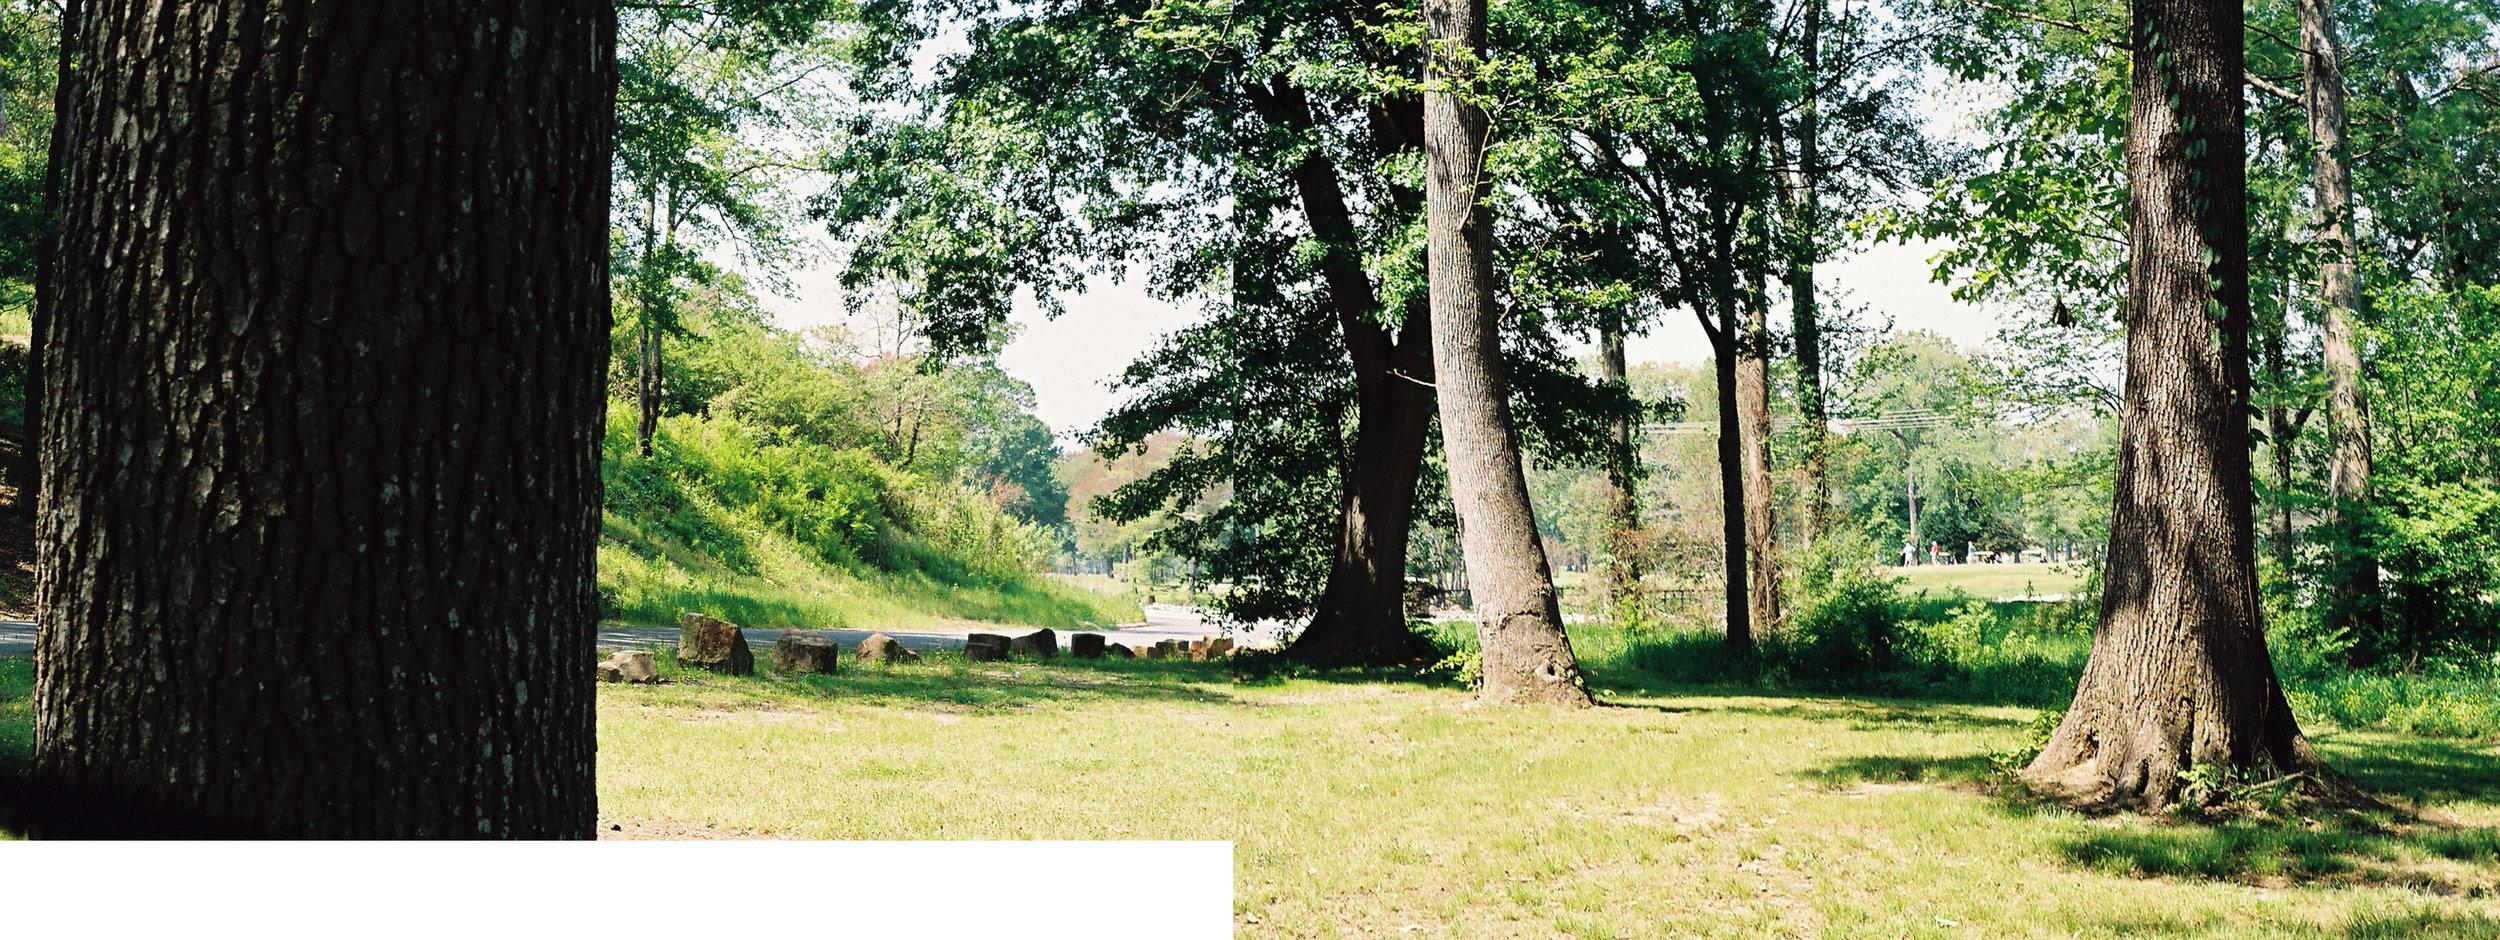 Hindman Park